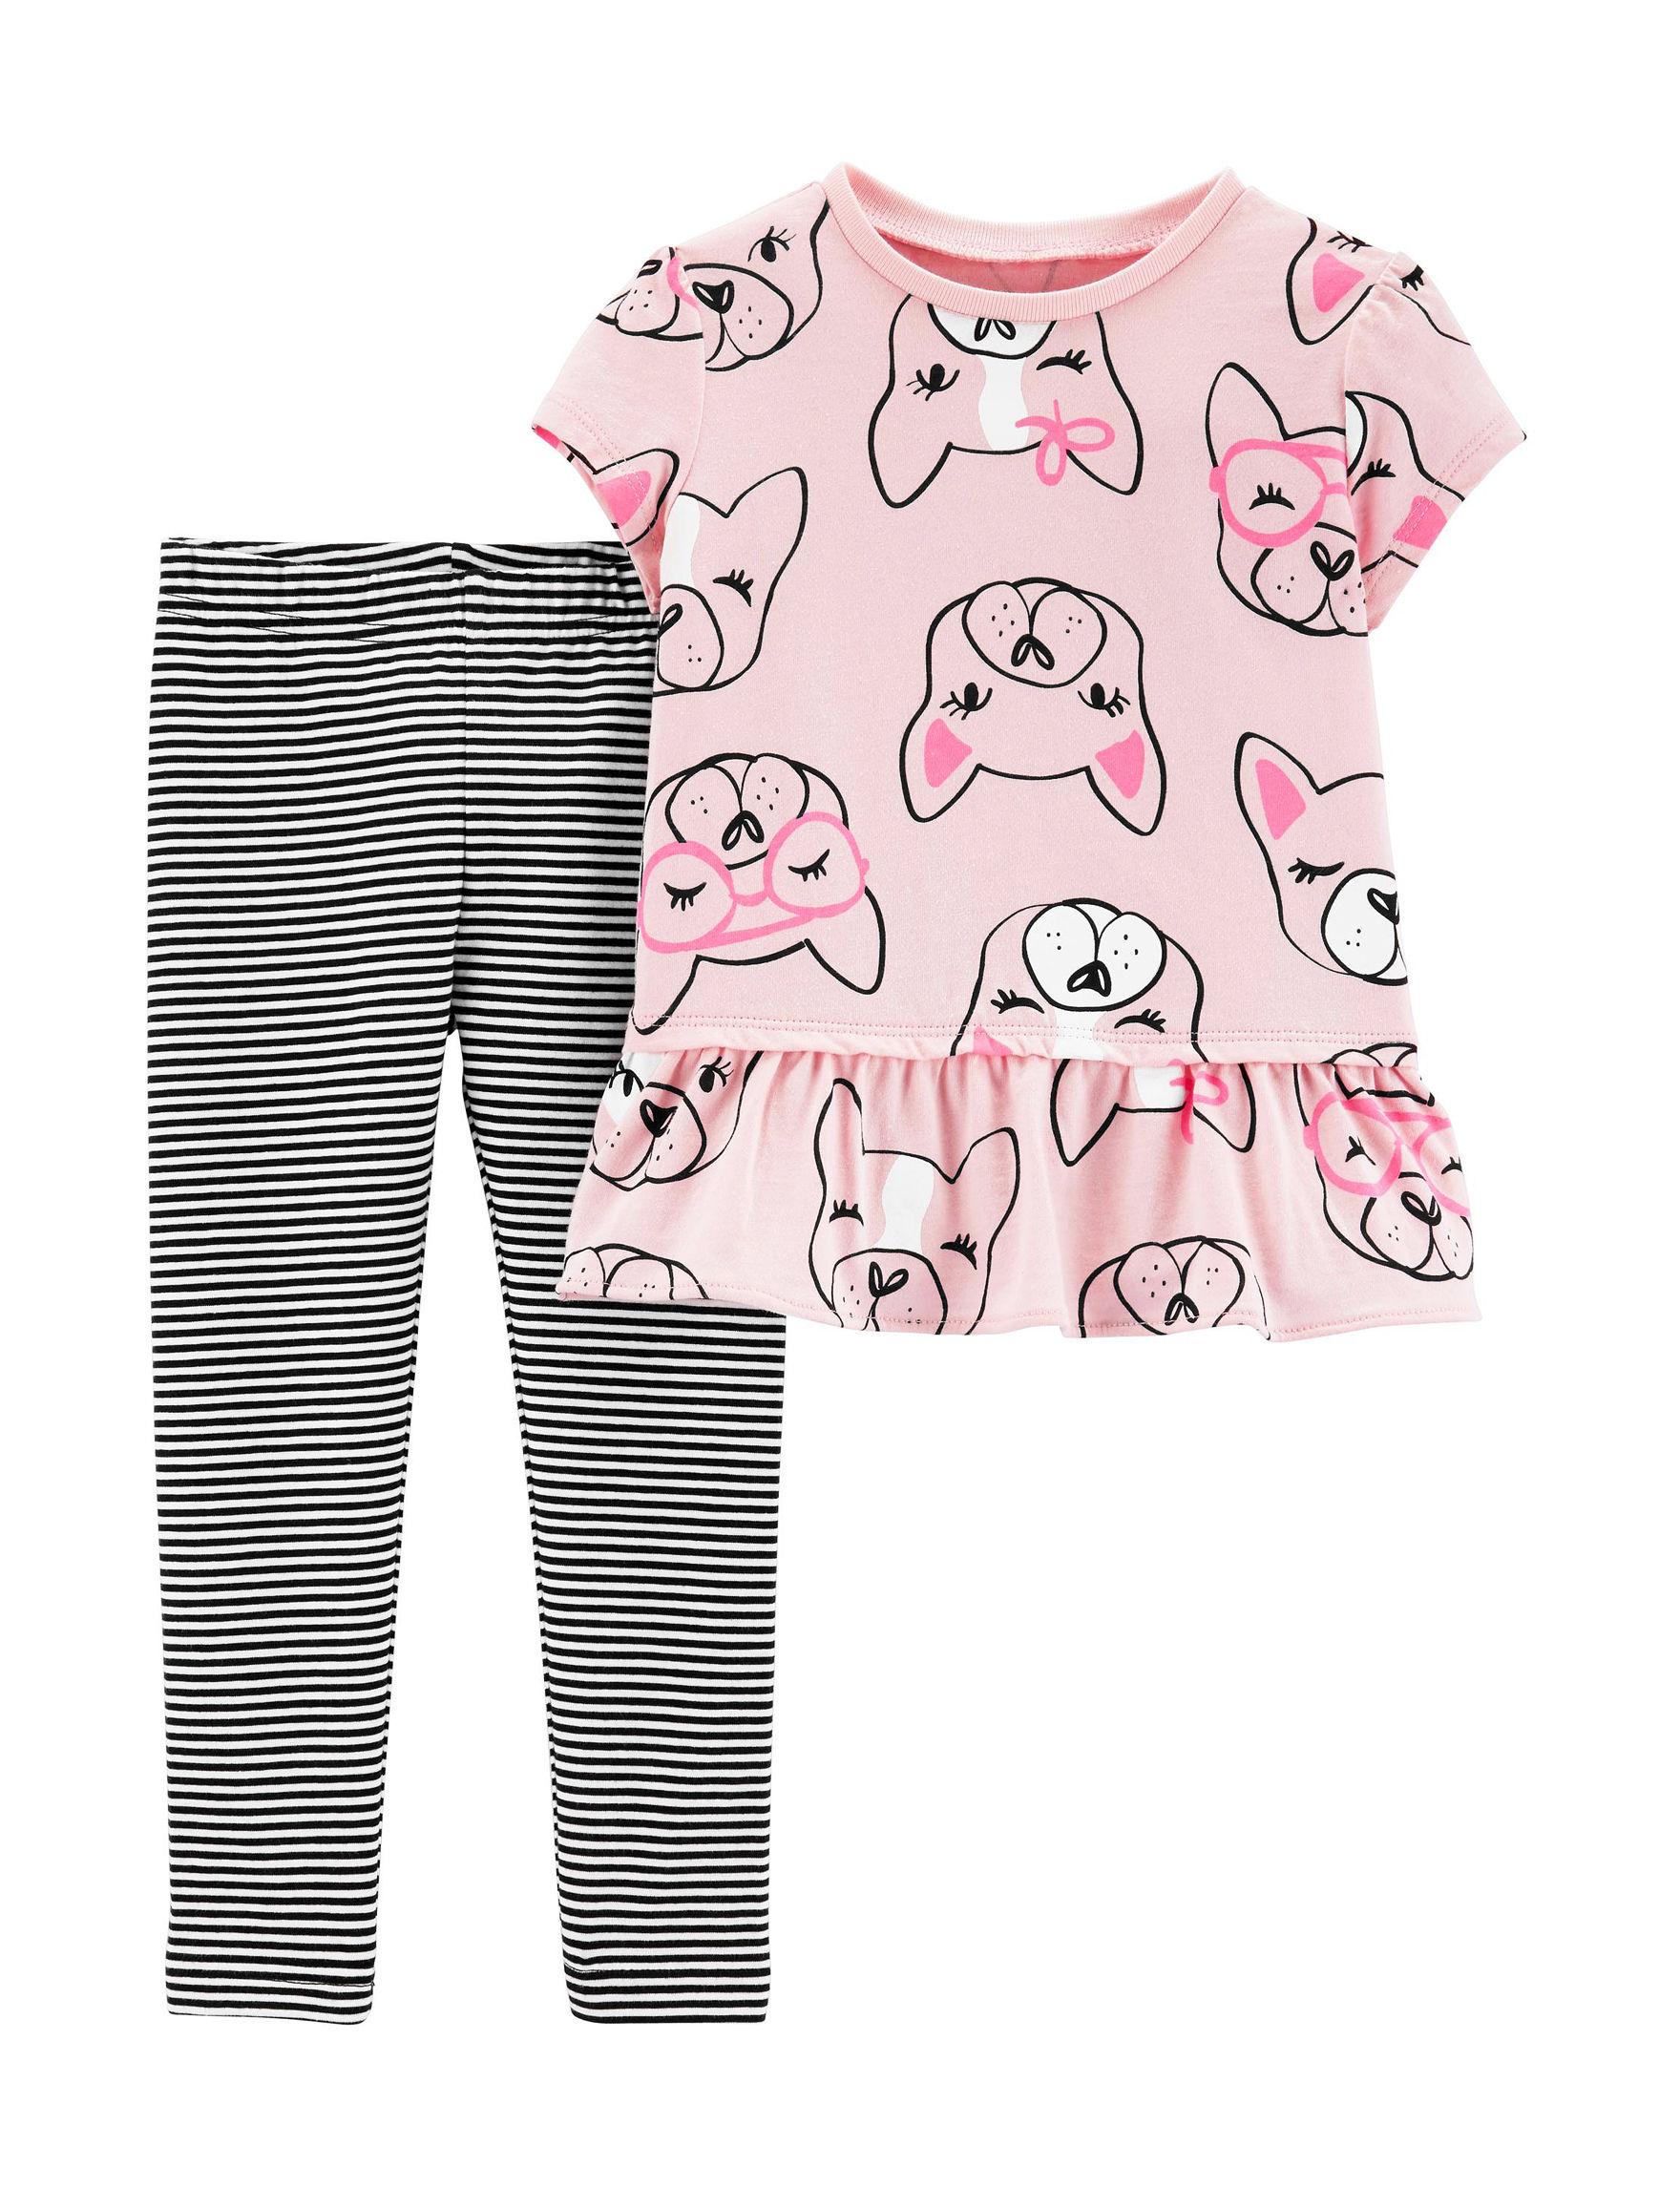 Carter's Pink Multi